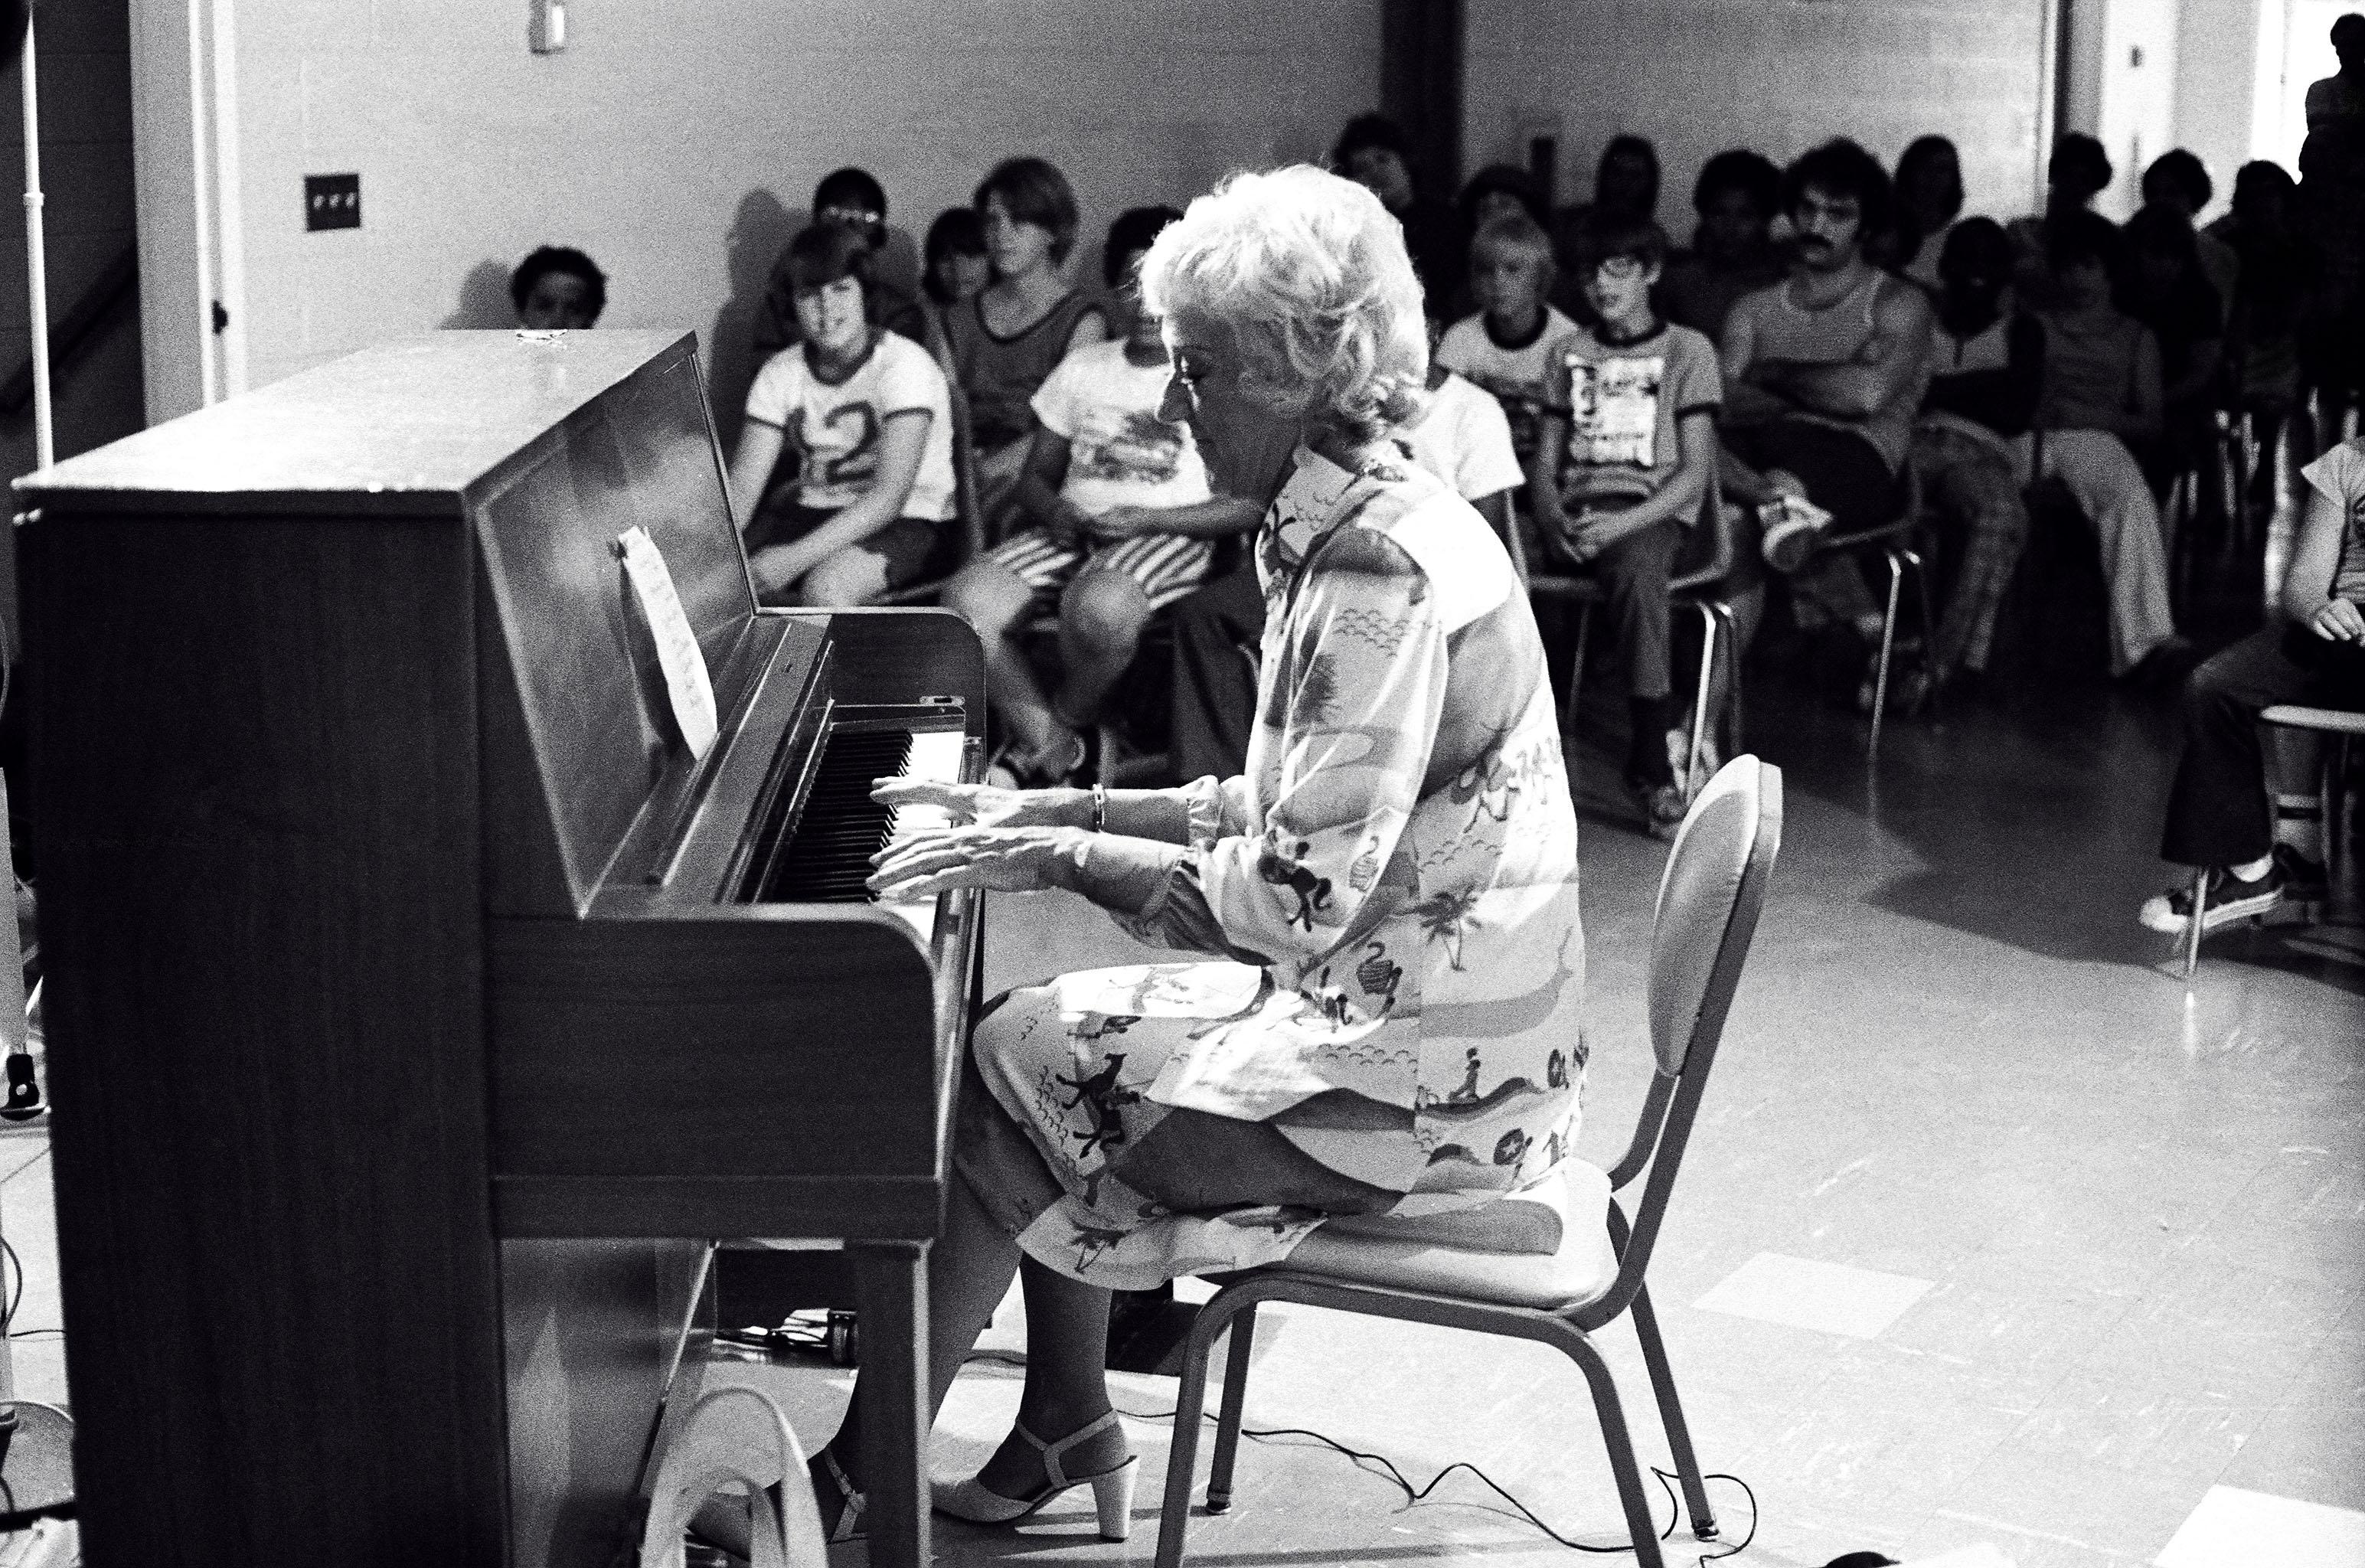 McPartland playing at St. Joseph's Villa near [[Rochester, New York|Rochester]], [[New York (state)|New York]], in 1975